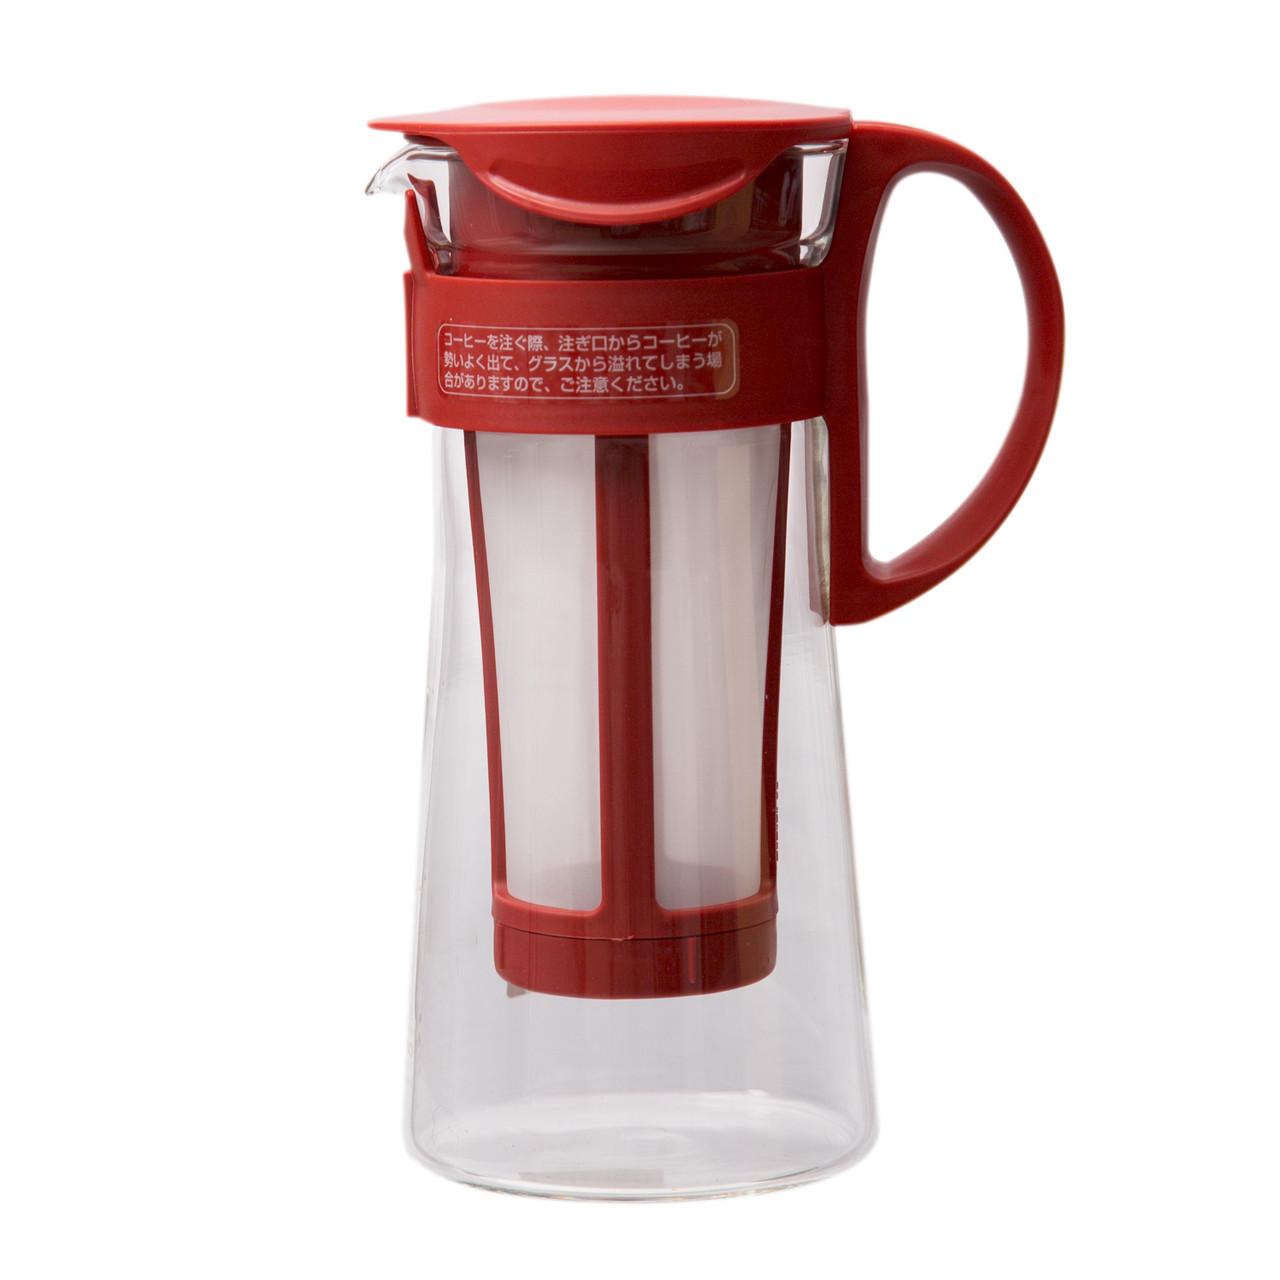 Cold Brew Coffee Pot